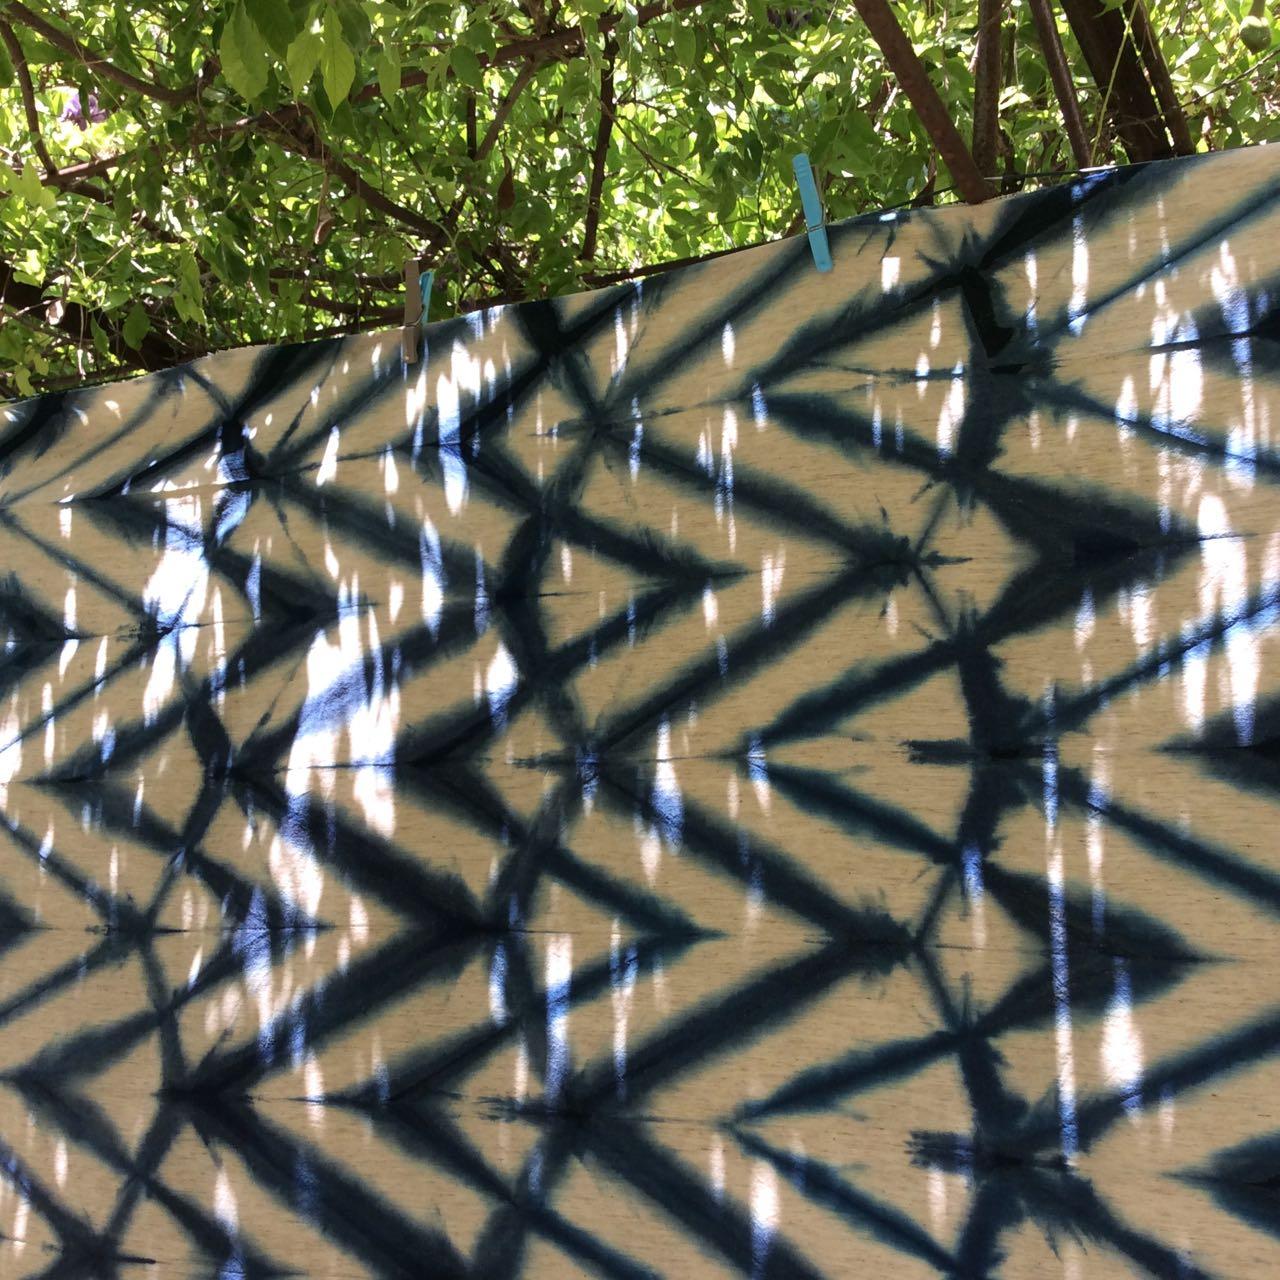 Itajime shibori indigo dye at Mei Line